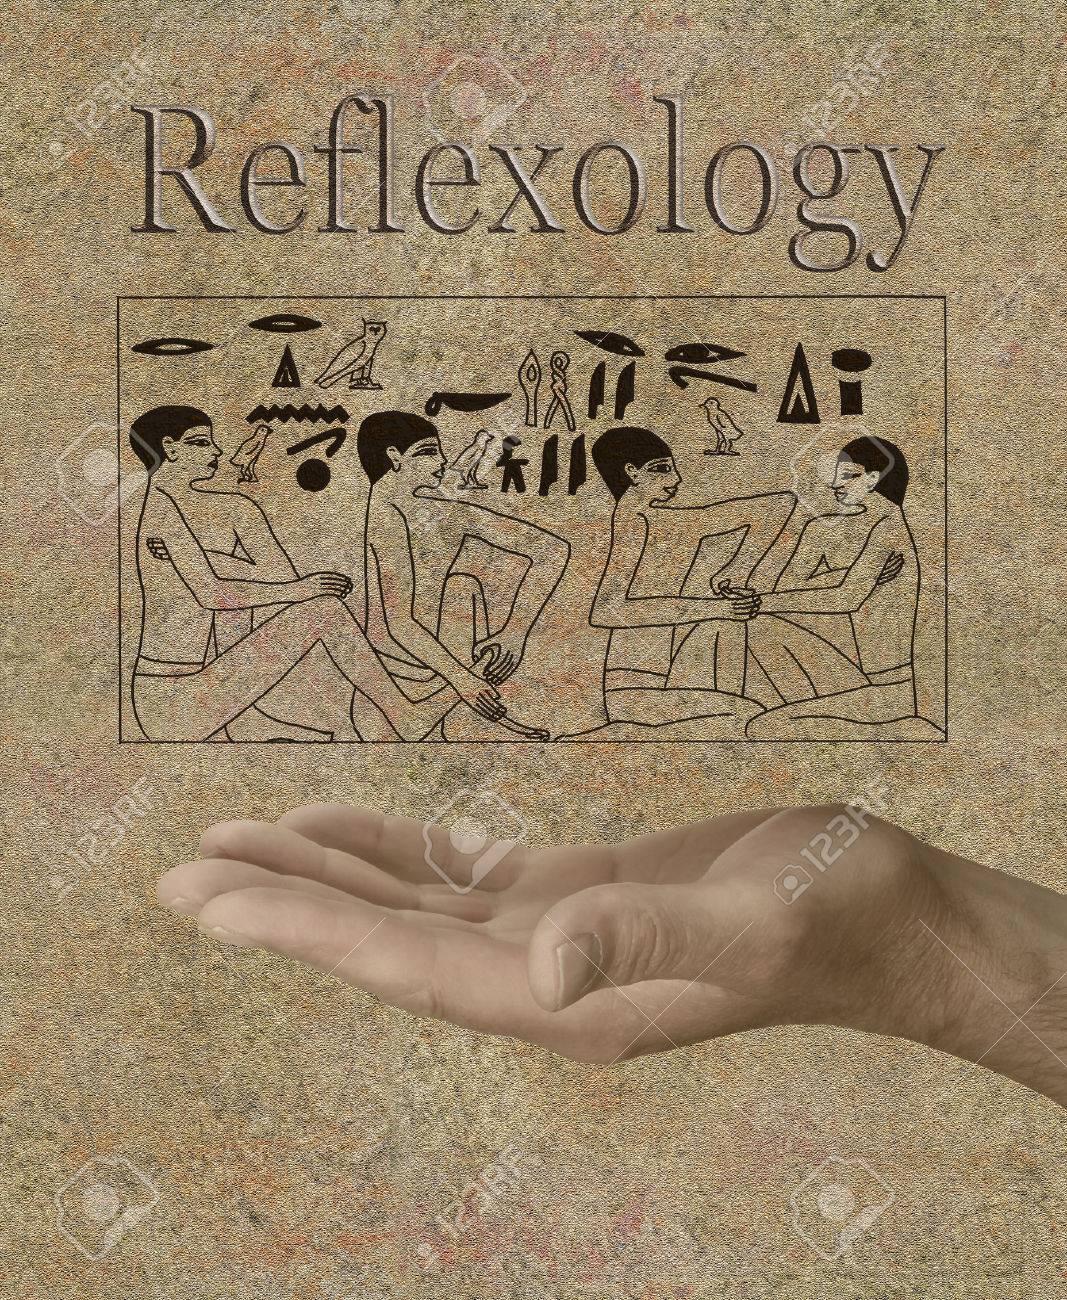 Reflexology depicted in Ancient Egyptian Hieroglyphics